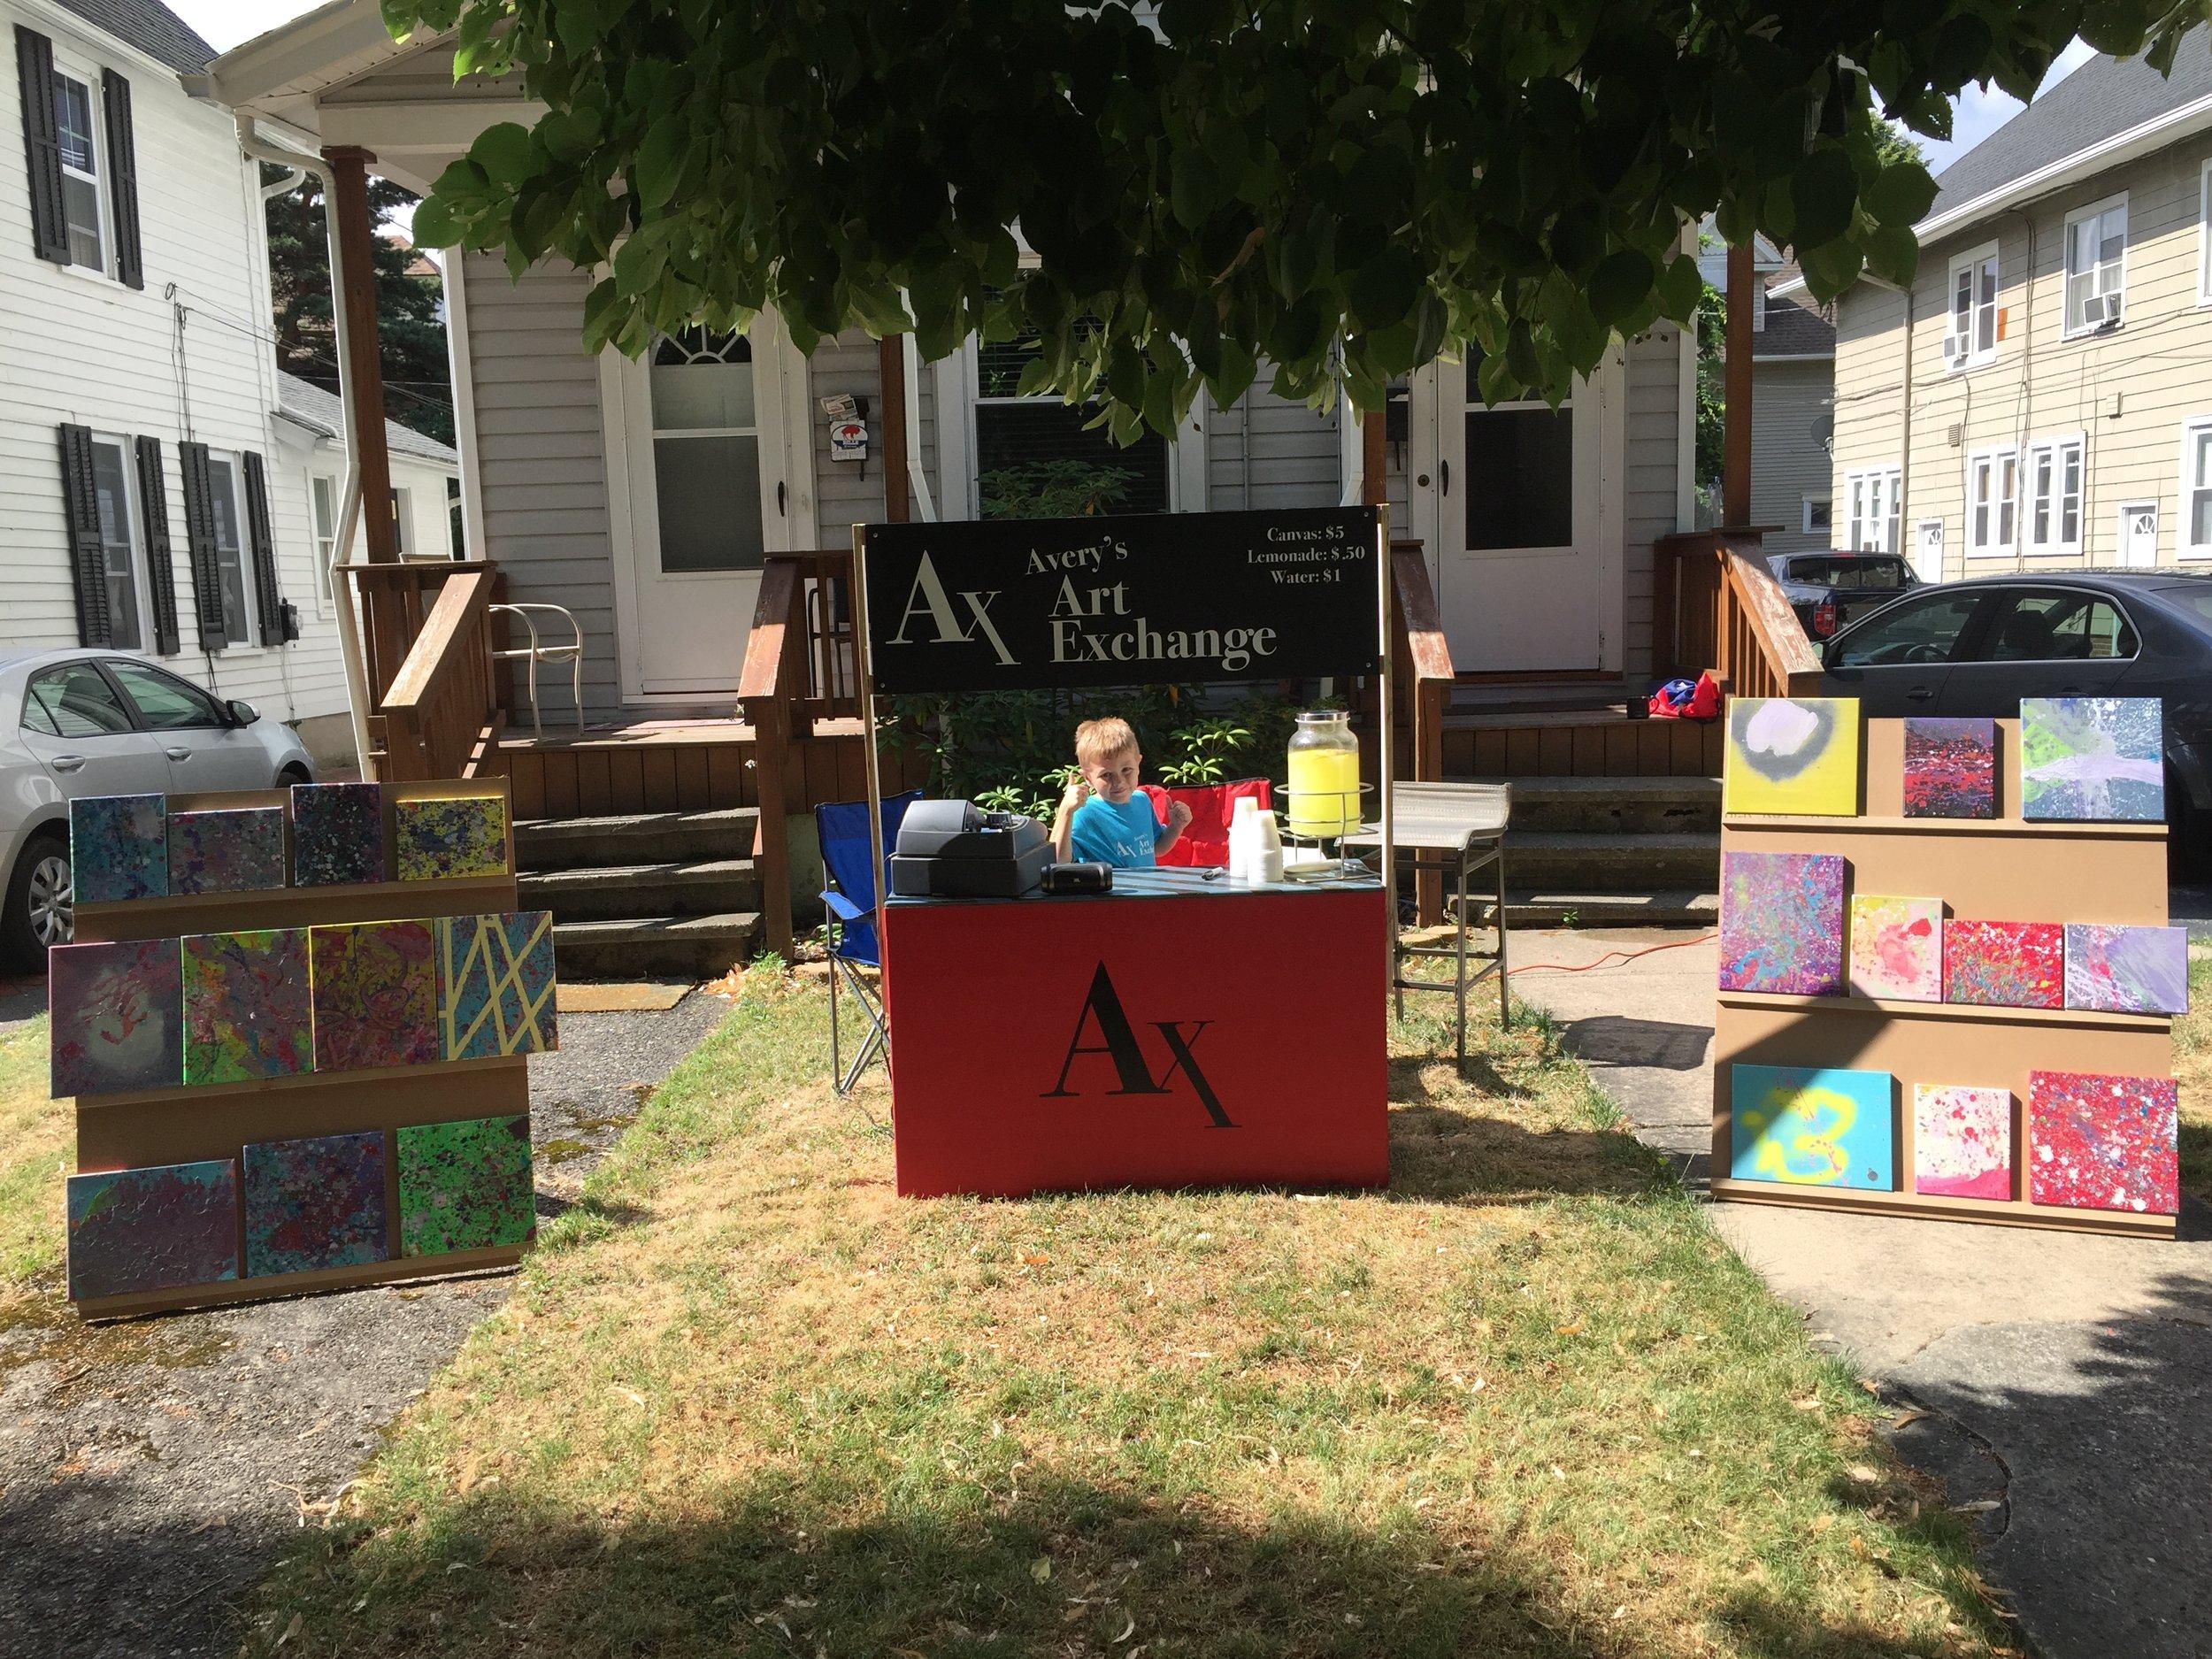 Avery's Art Exchange